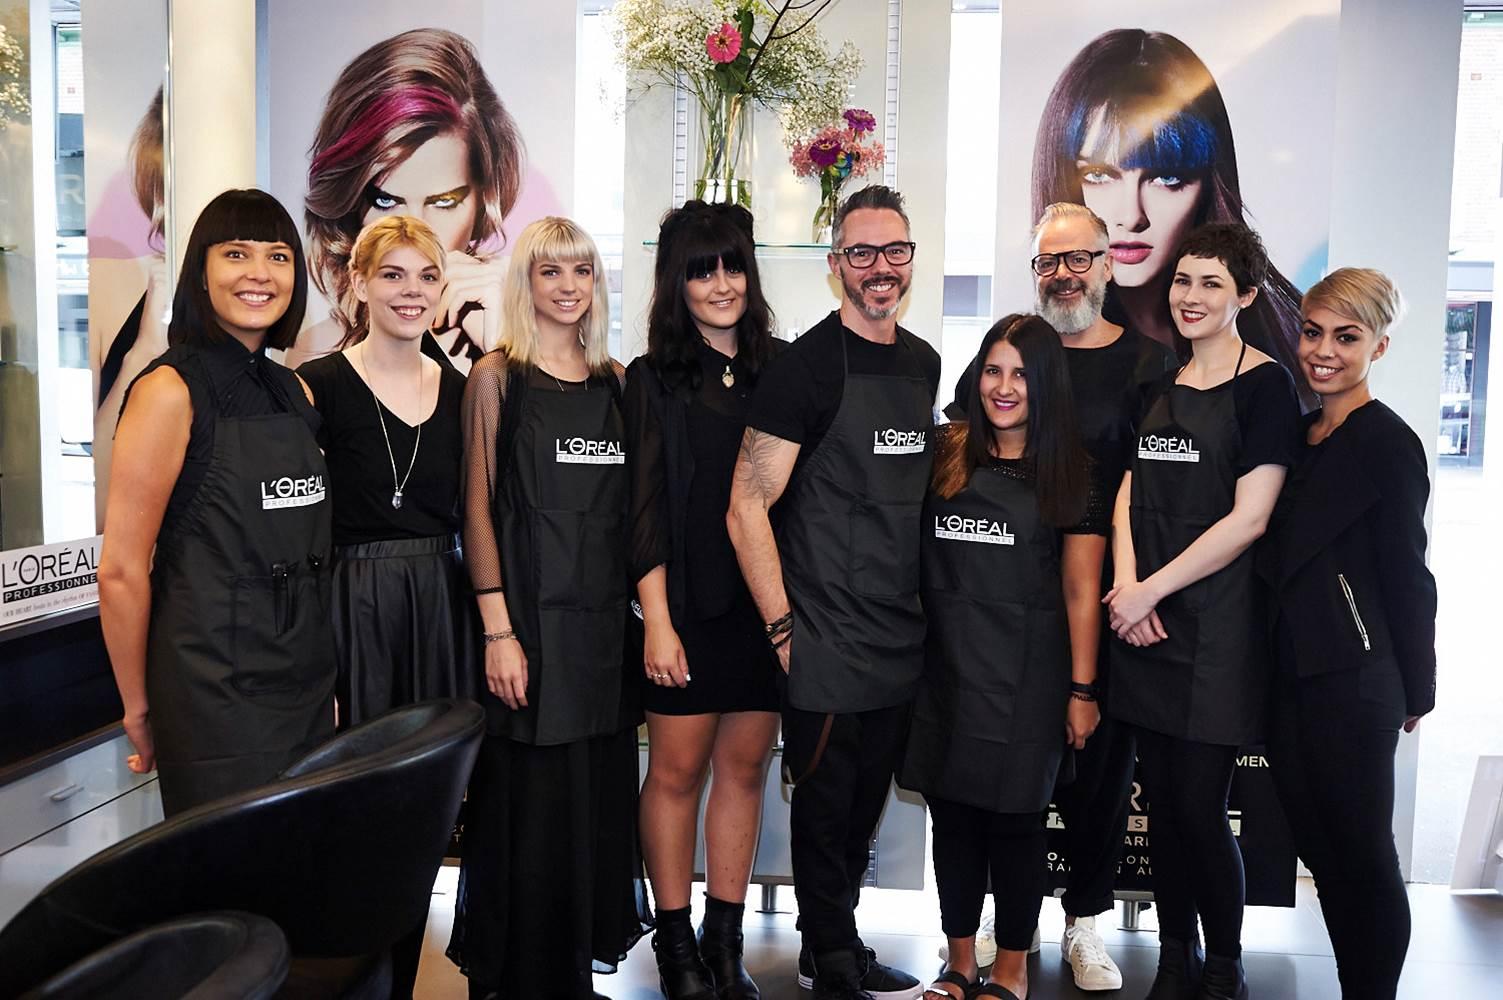 L'Oréal Professionnel Hairchalk launch 2014 _Murphy Gozzard team.jpg